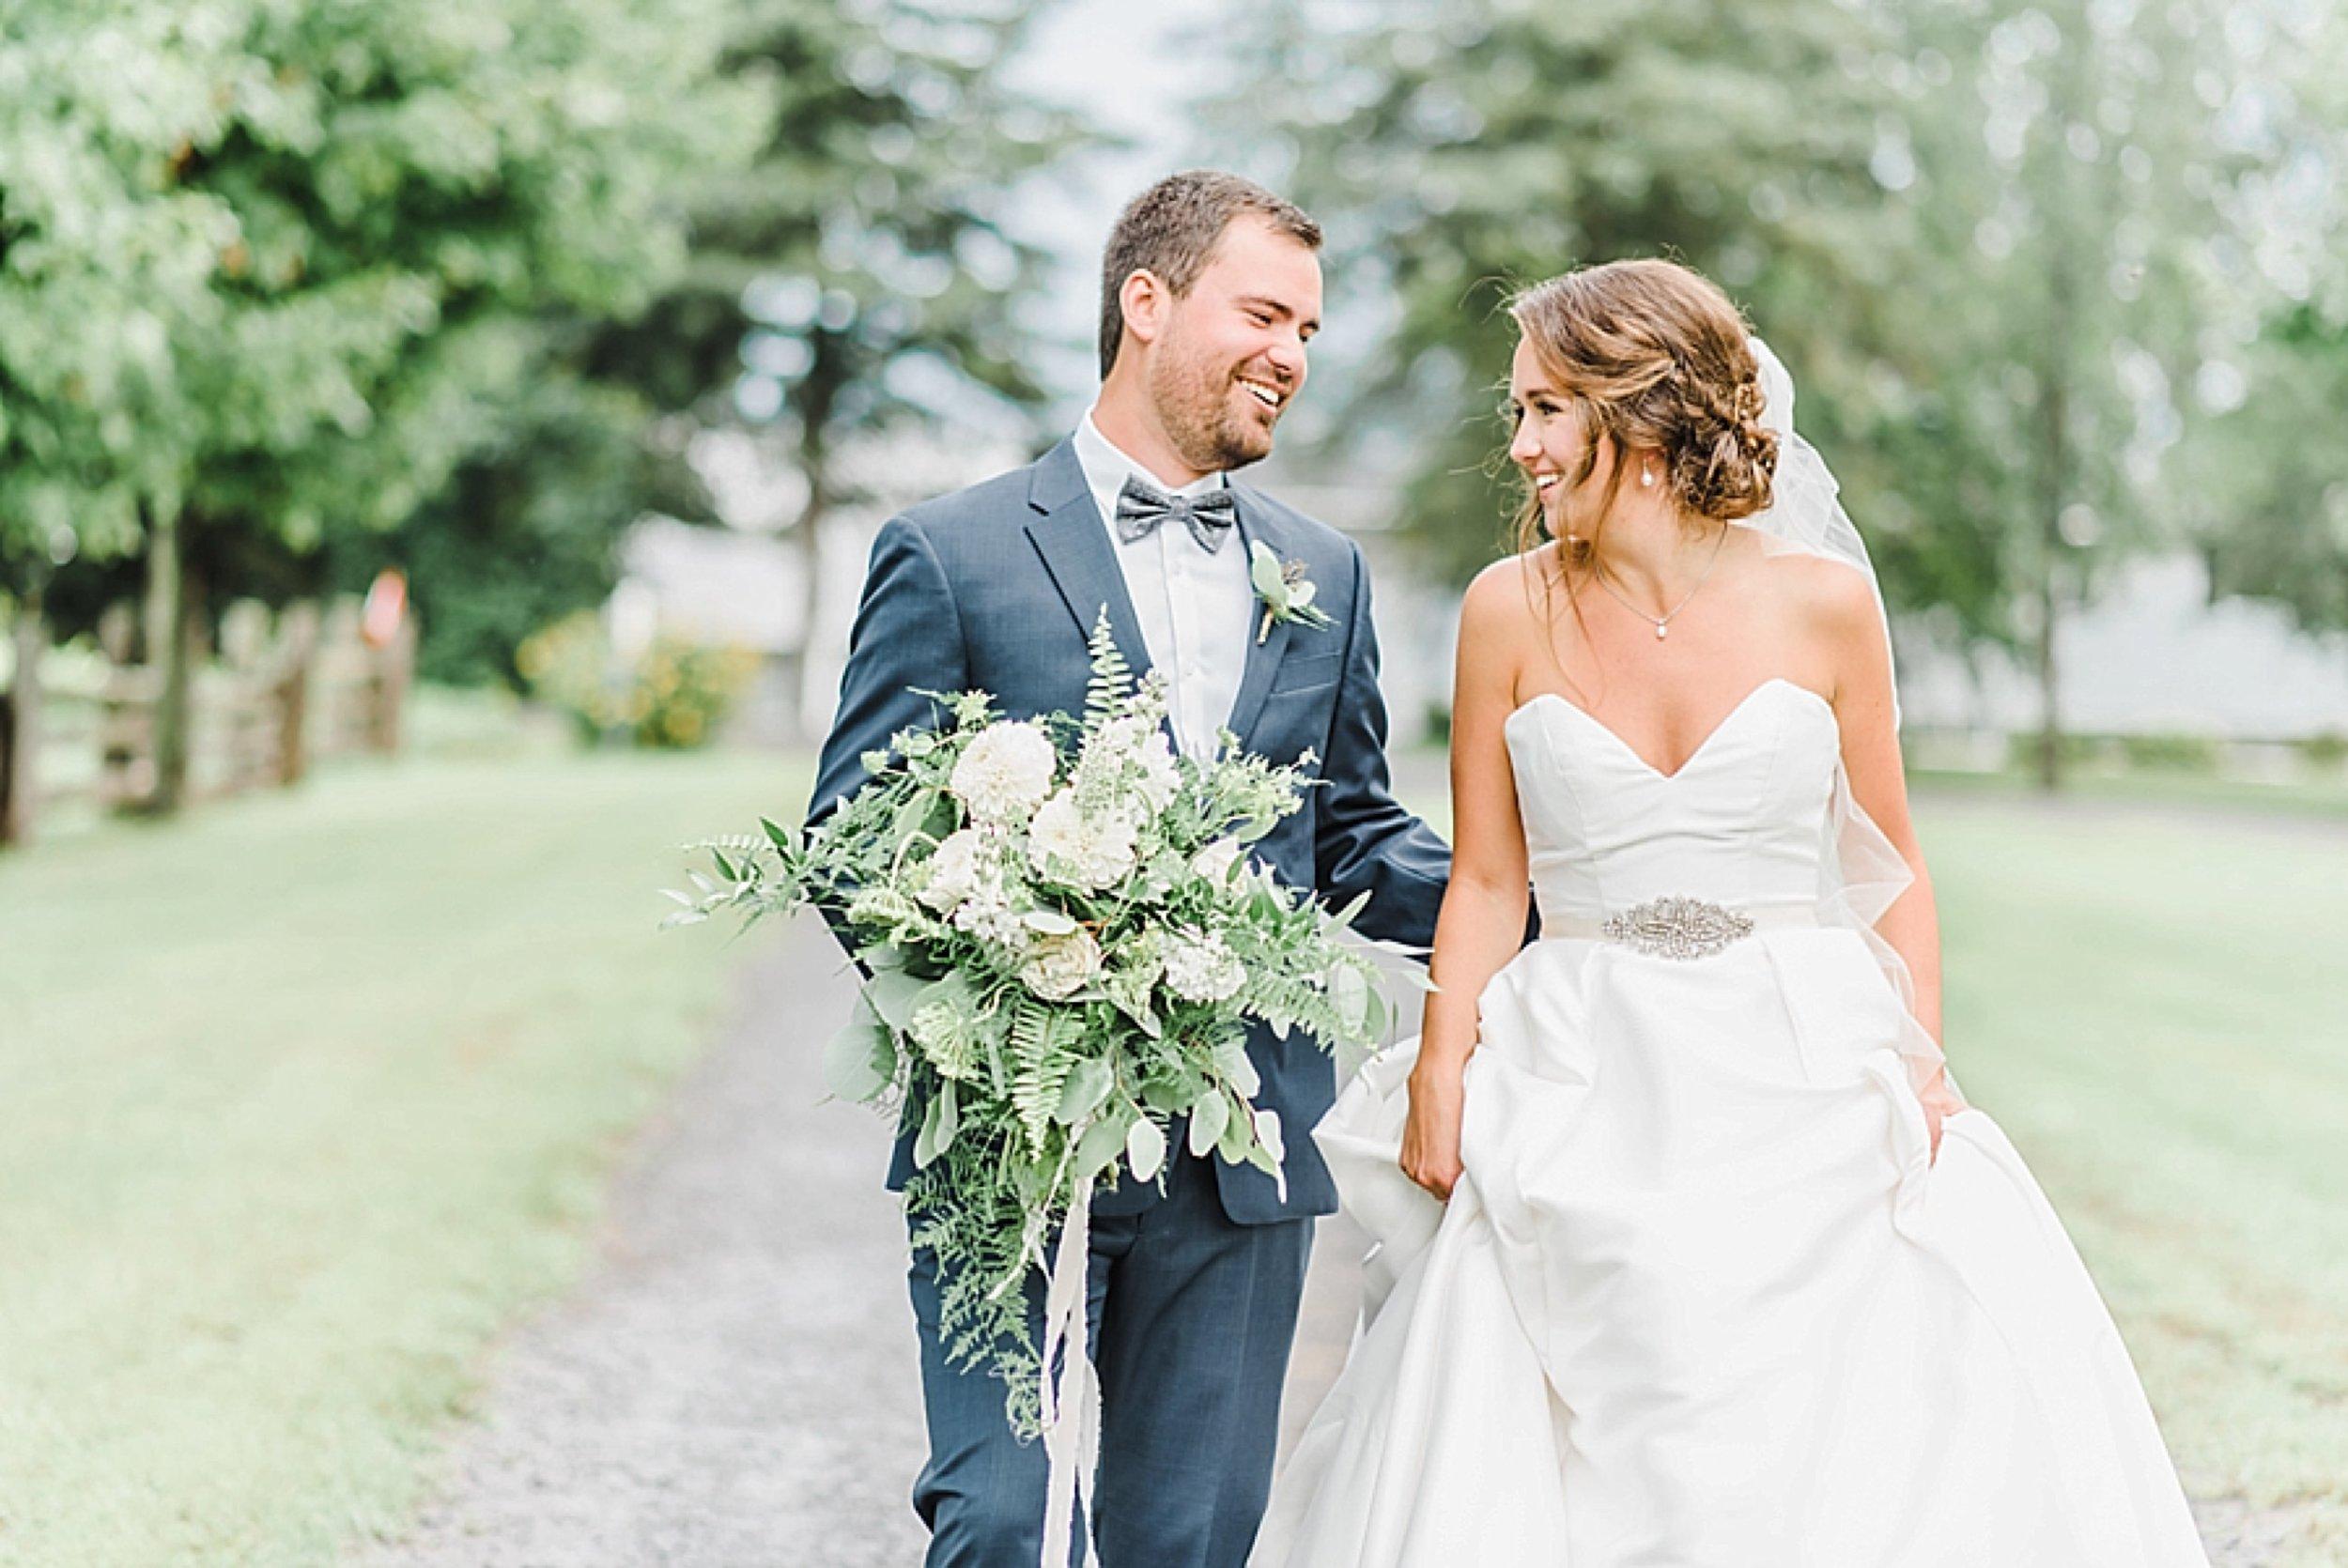 light airy indie fine art ottawa wedding photographer | Ali and Batoul Photography_0501.jpg